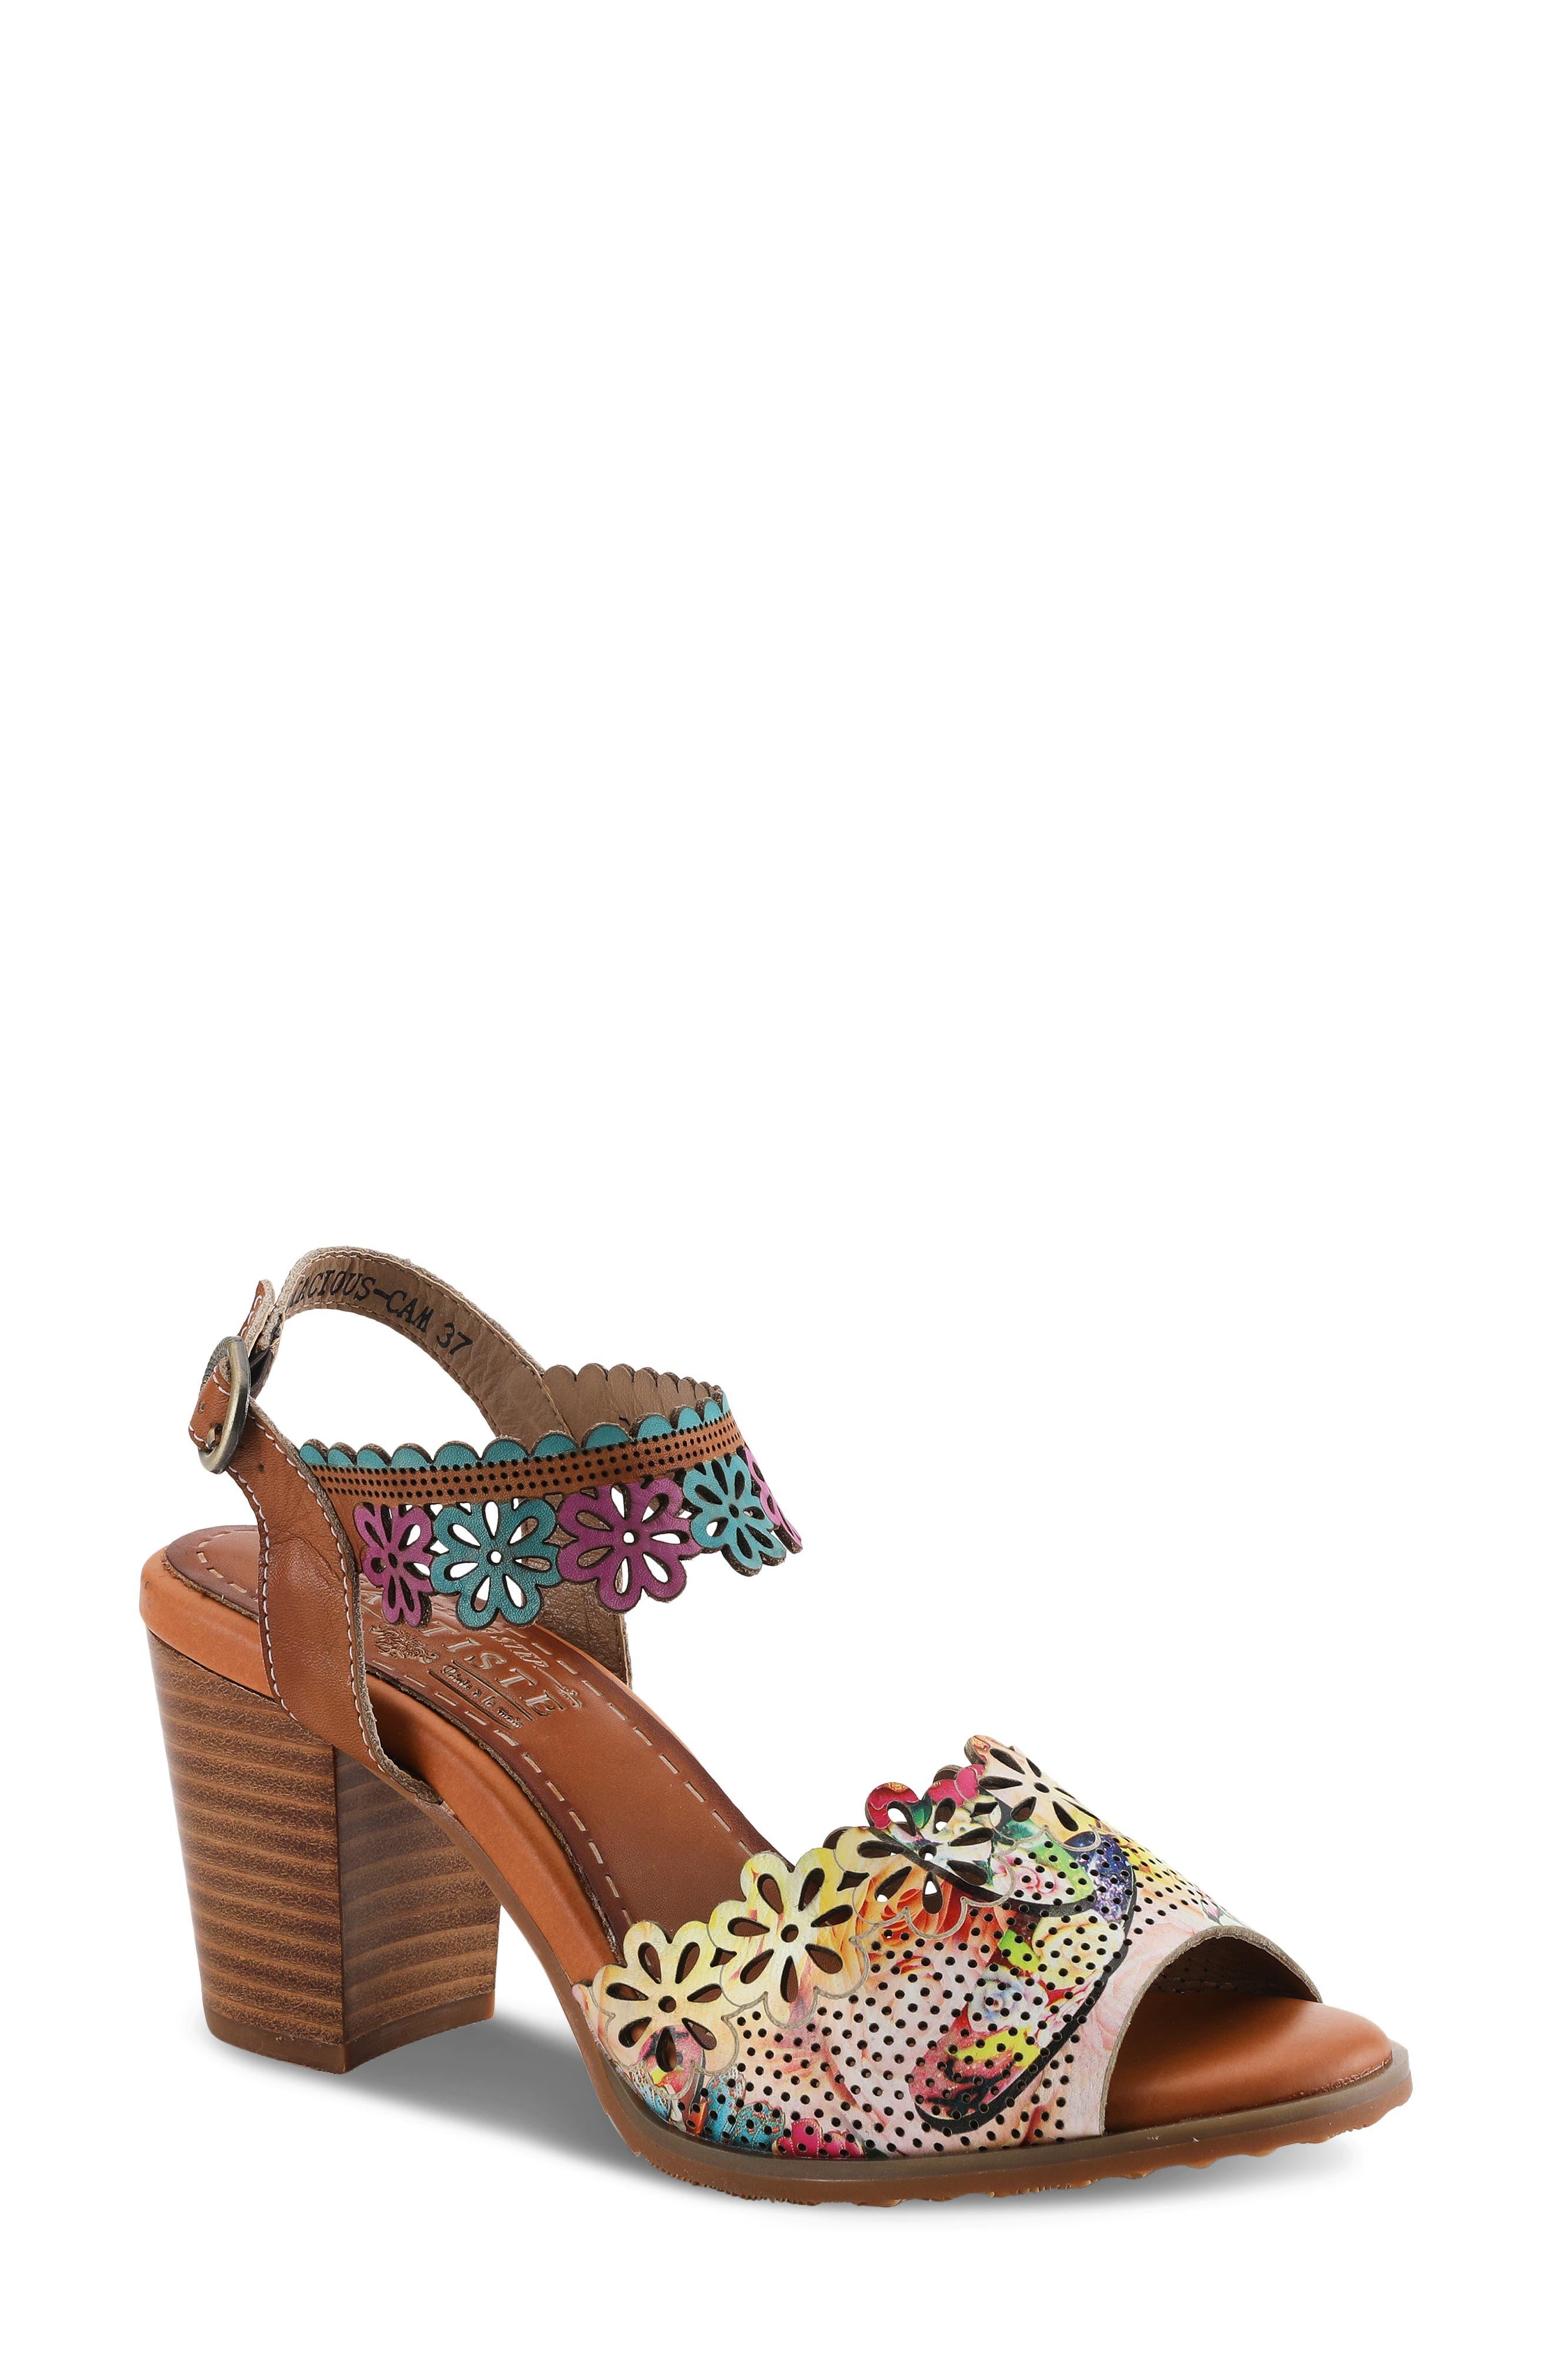 Floradacious Ankle Strap Sandal